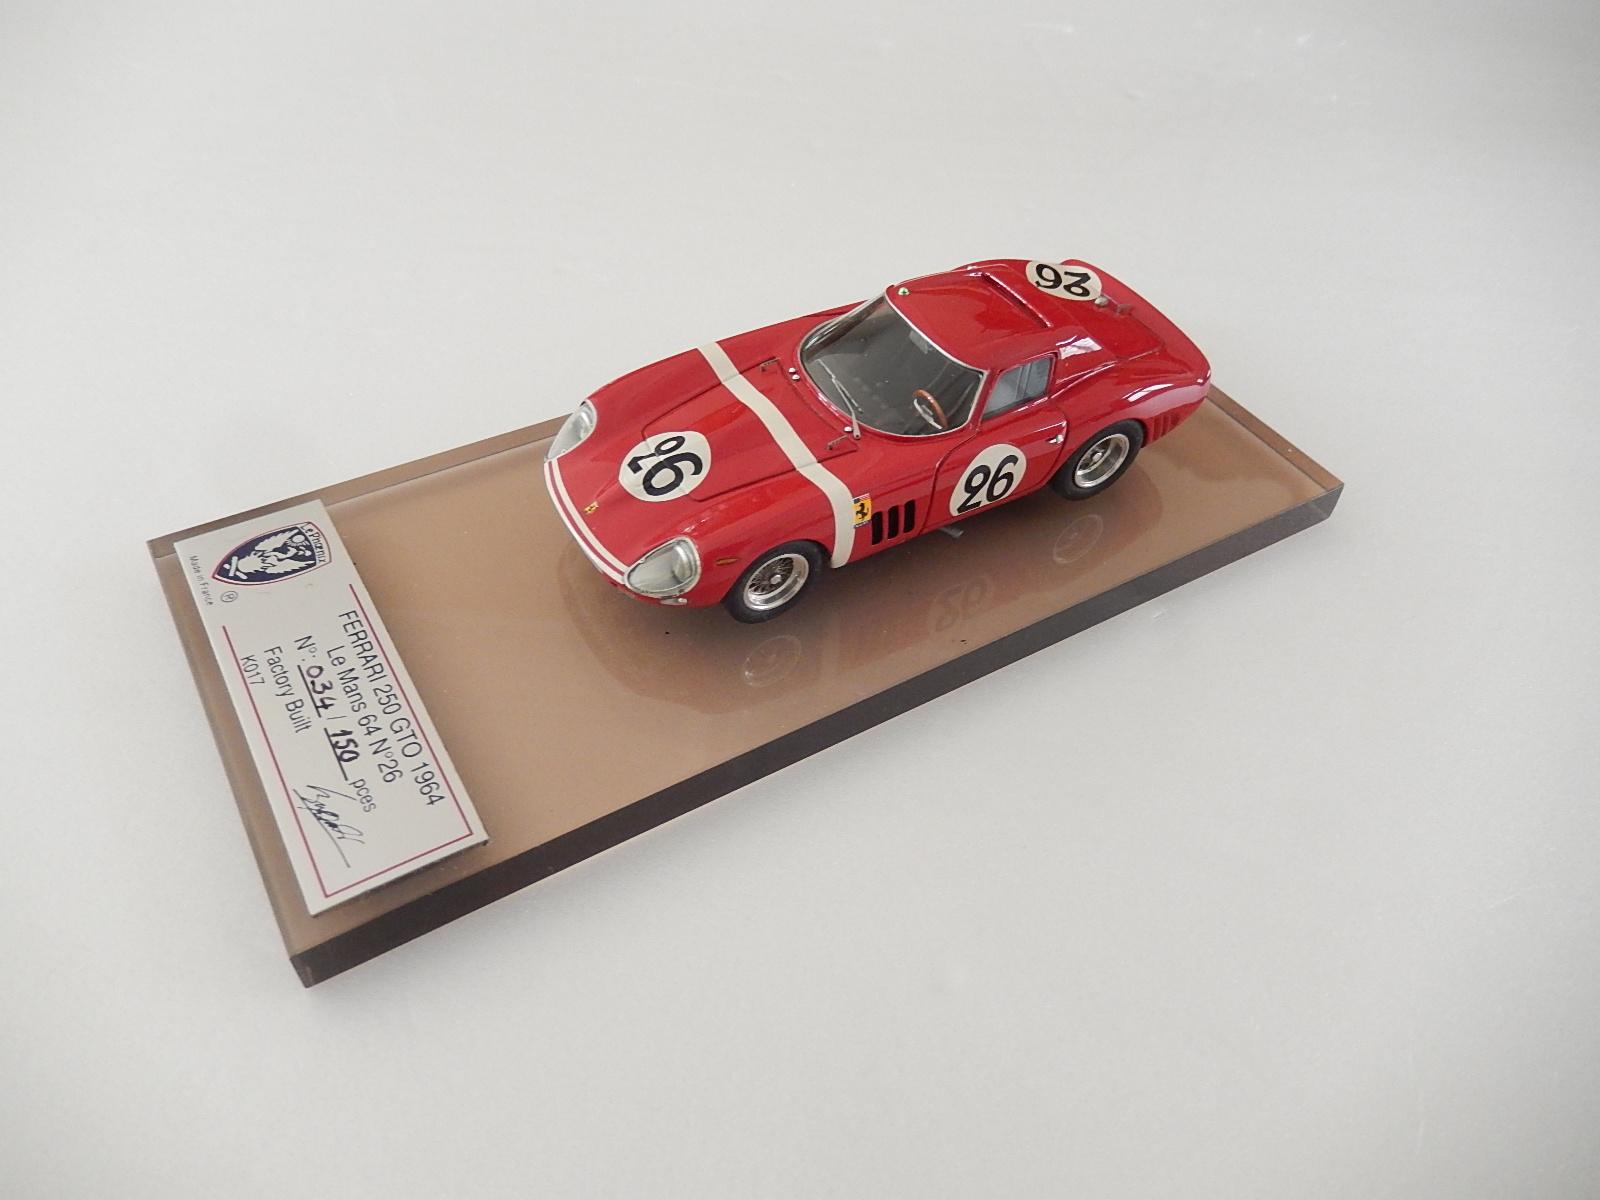 Lephoenix Ferrari 250 Gto 64 Le Mans 1964 Sold Modelart111